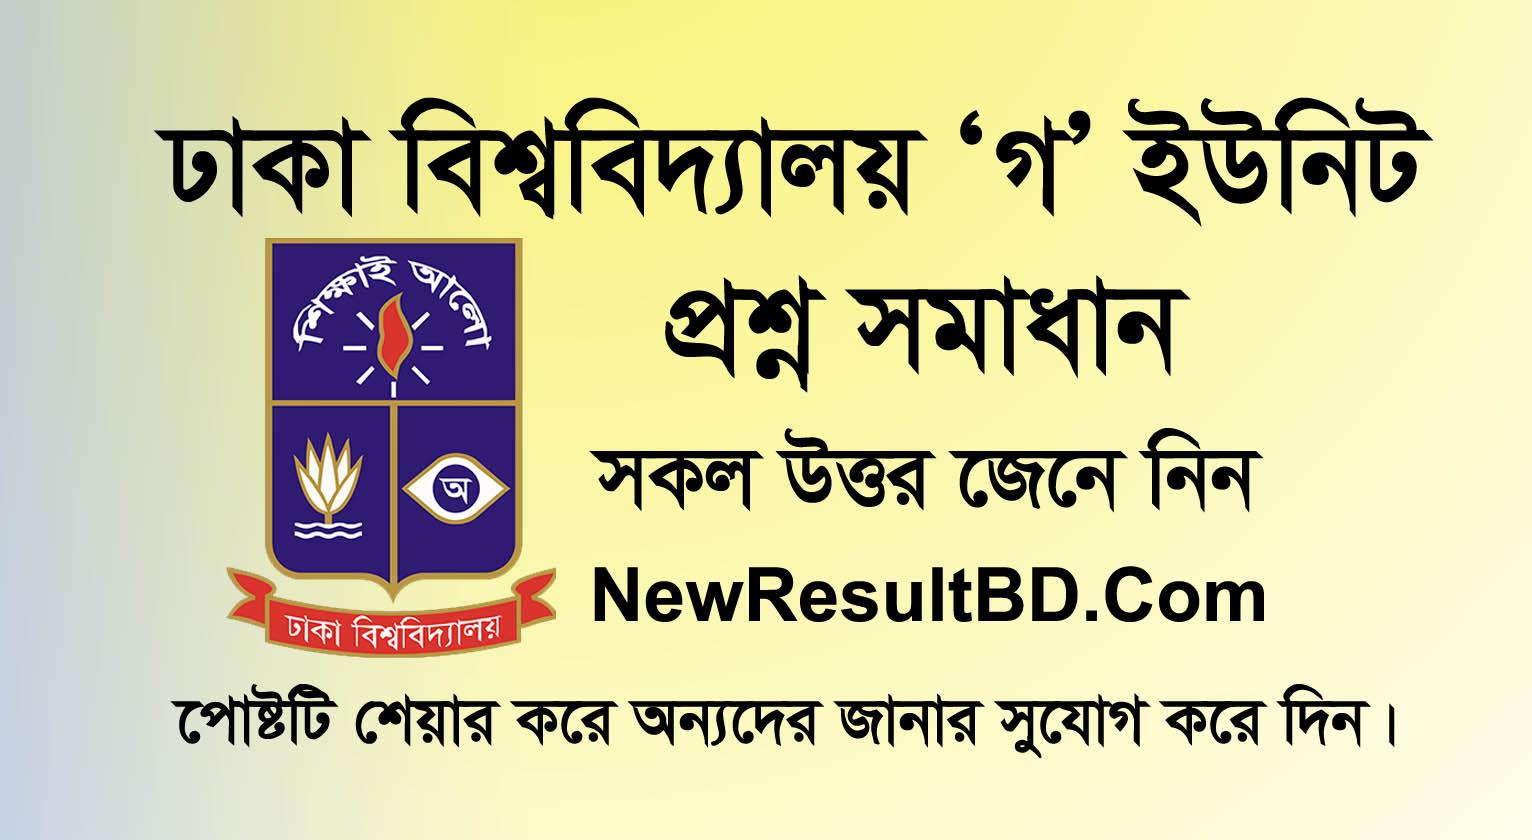 Dhaka University C Unit Question Solution, C Unit Question Solve, ঢাকা বিশ্ববিদ্যালয়ের গ ইউুনিটের প্রশ্নপত্র সমাধান ২০১৯, DU Ga Unit Answers, Commerce Exam.